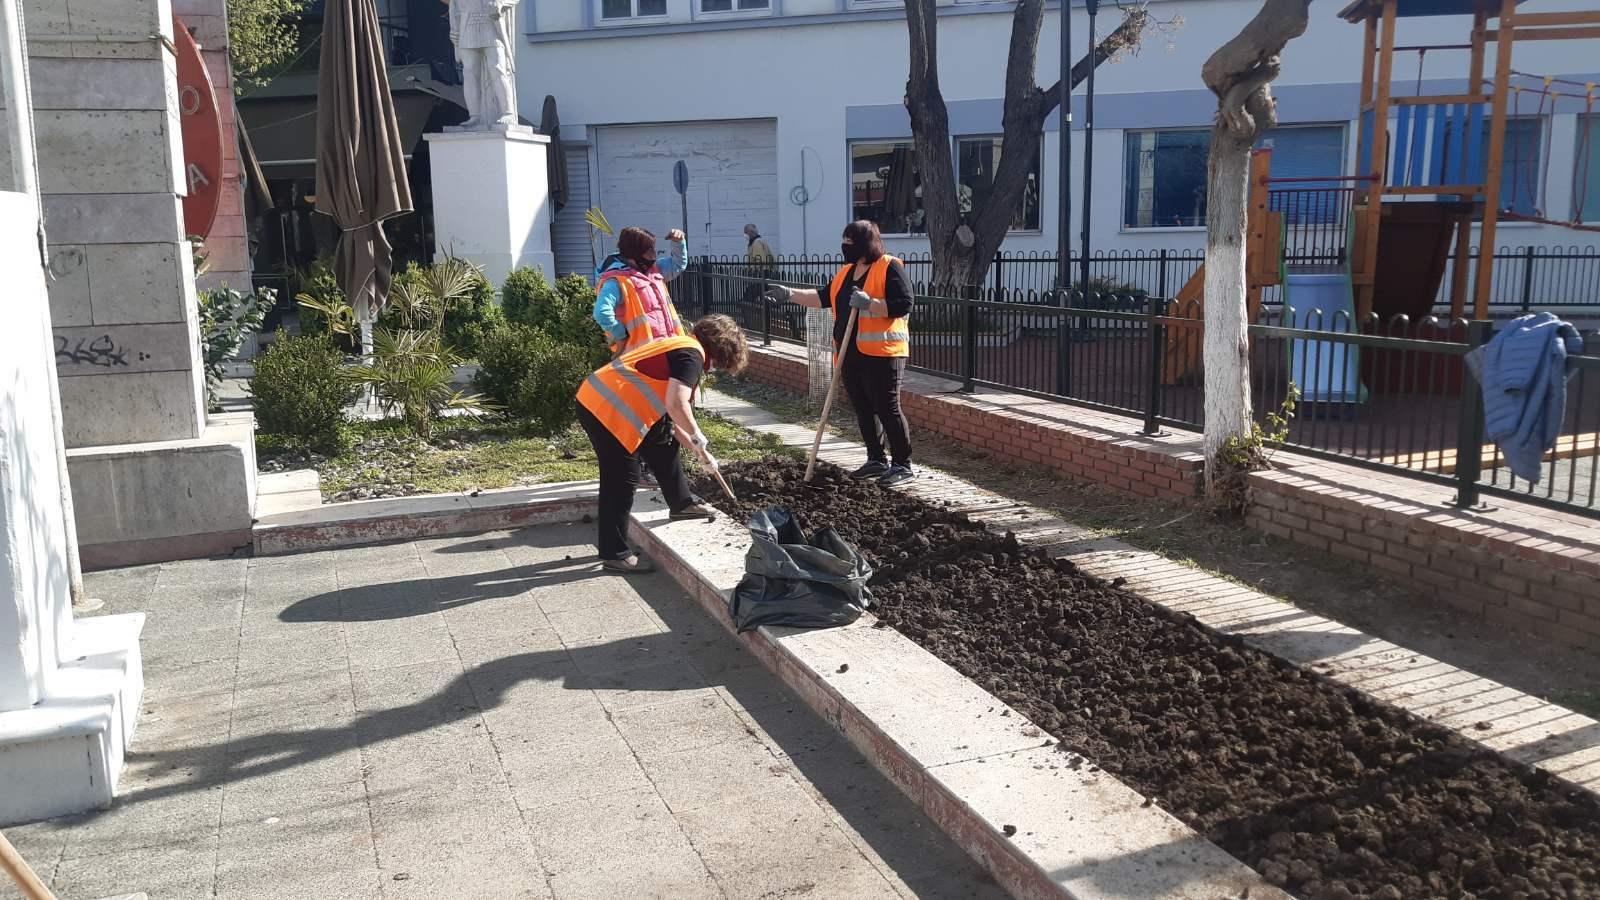 kozan.gr: Εργασίες συντήρησης και καλλωπισμού σε κεντρικούς οδούς της πόλης της Πτολεμαΐδας (Φωτογραφίες & Βίντεο)